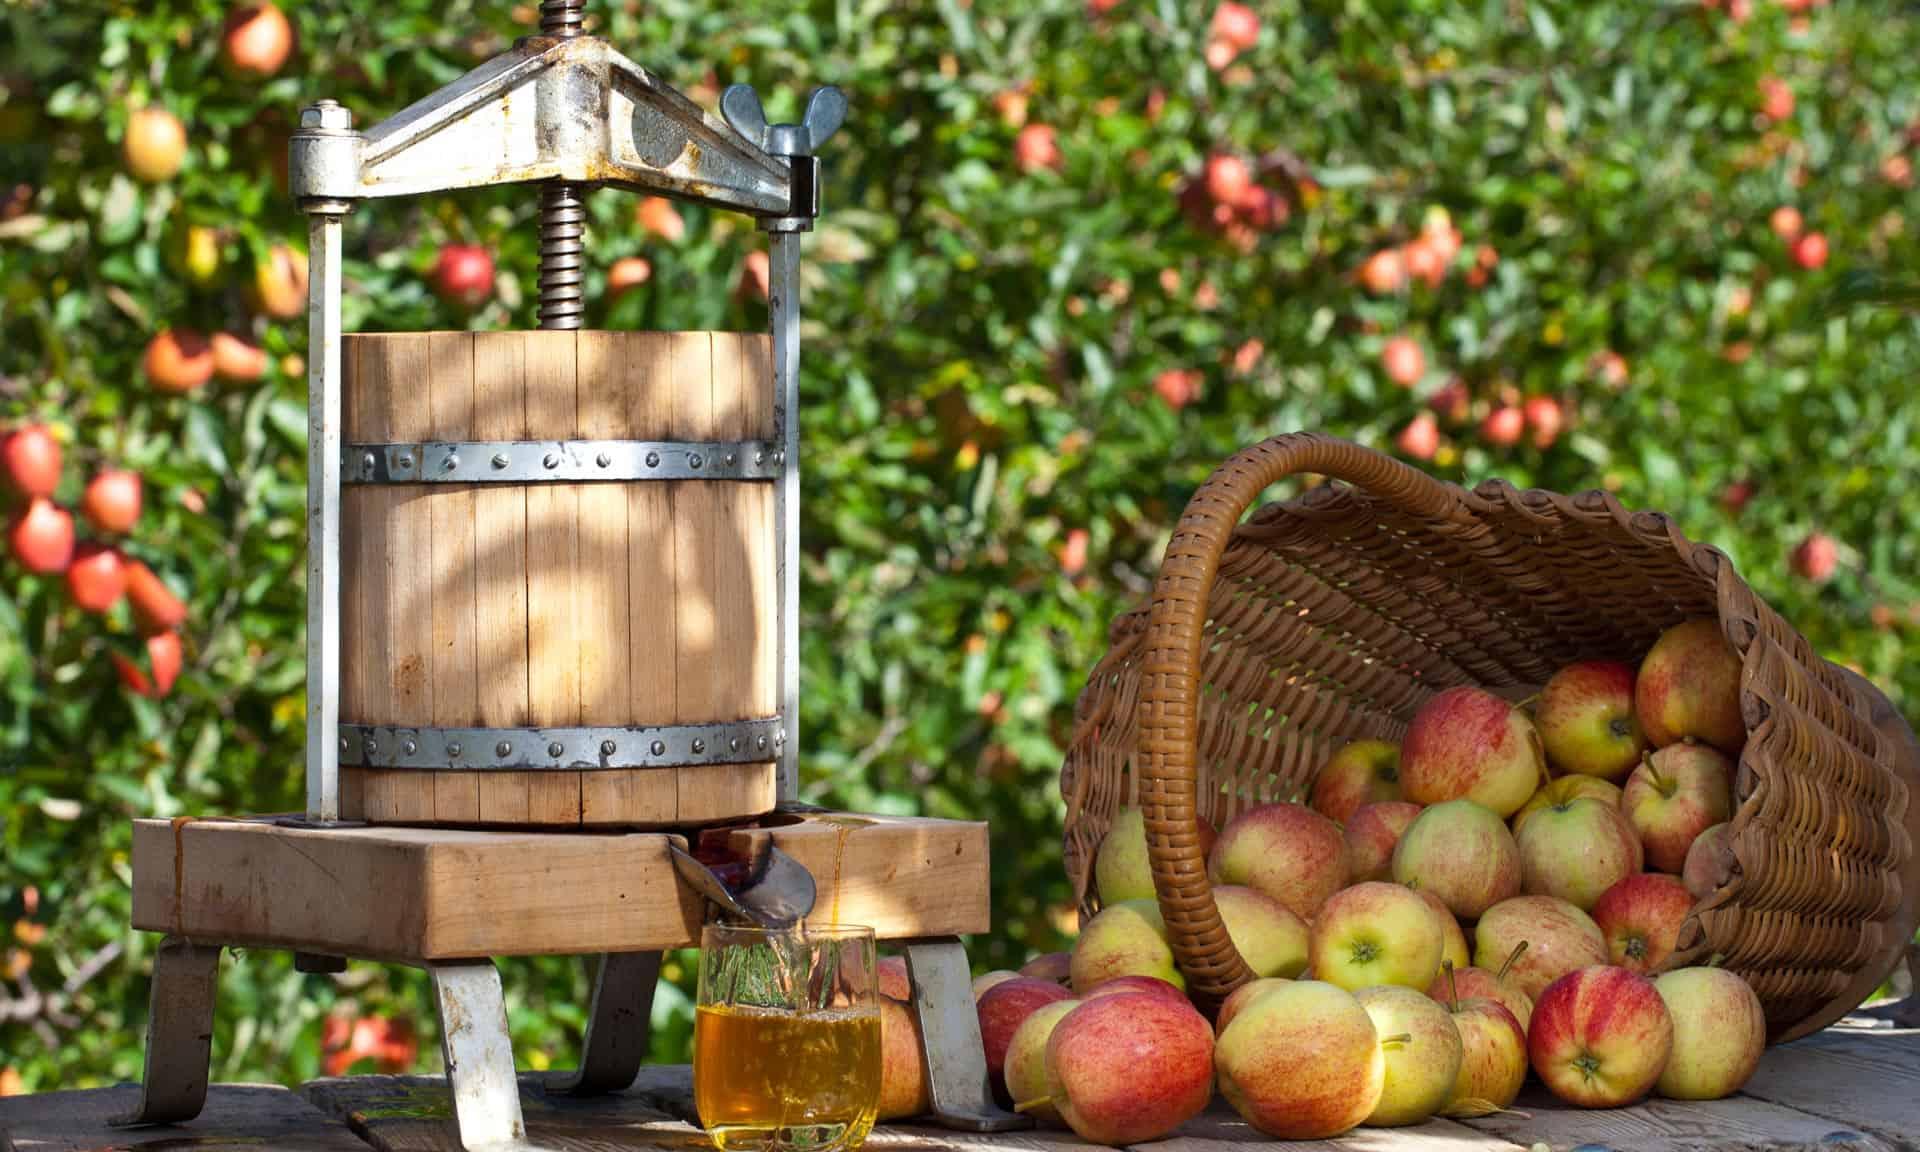 Cider-Apfelpresse-Brauunion-Graz